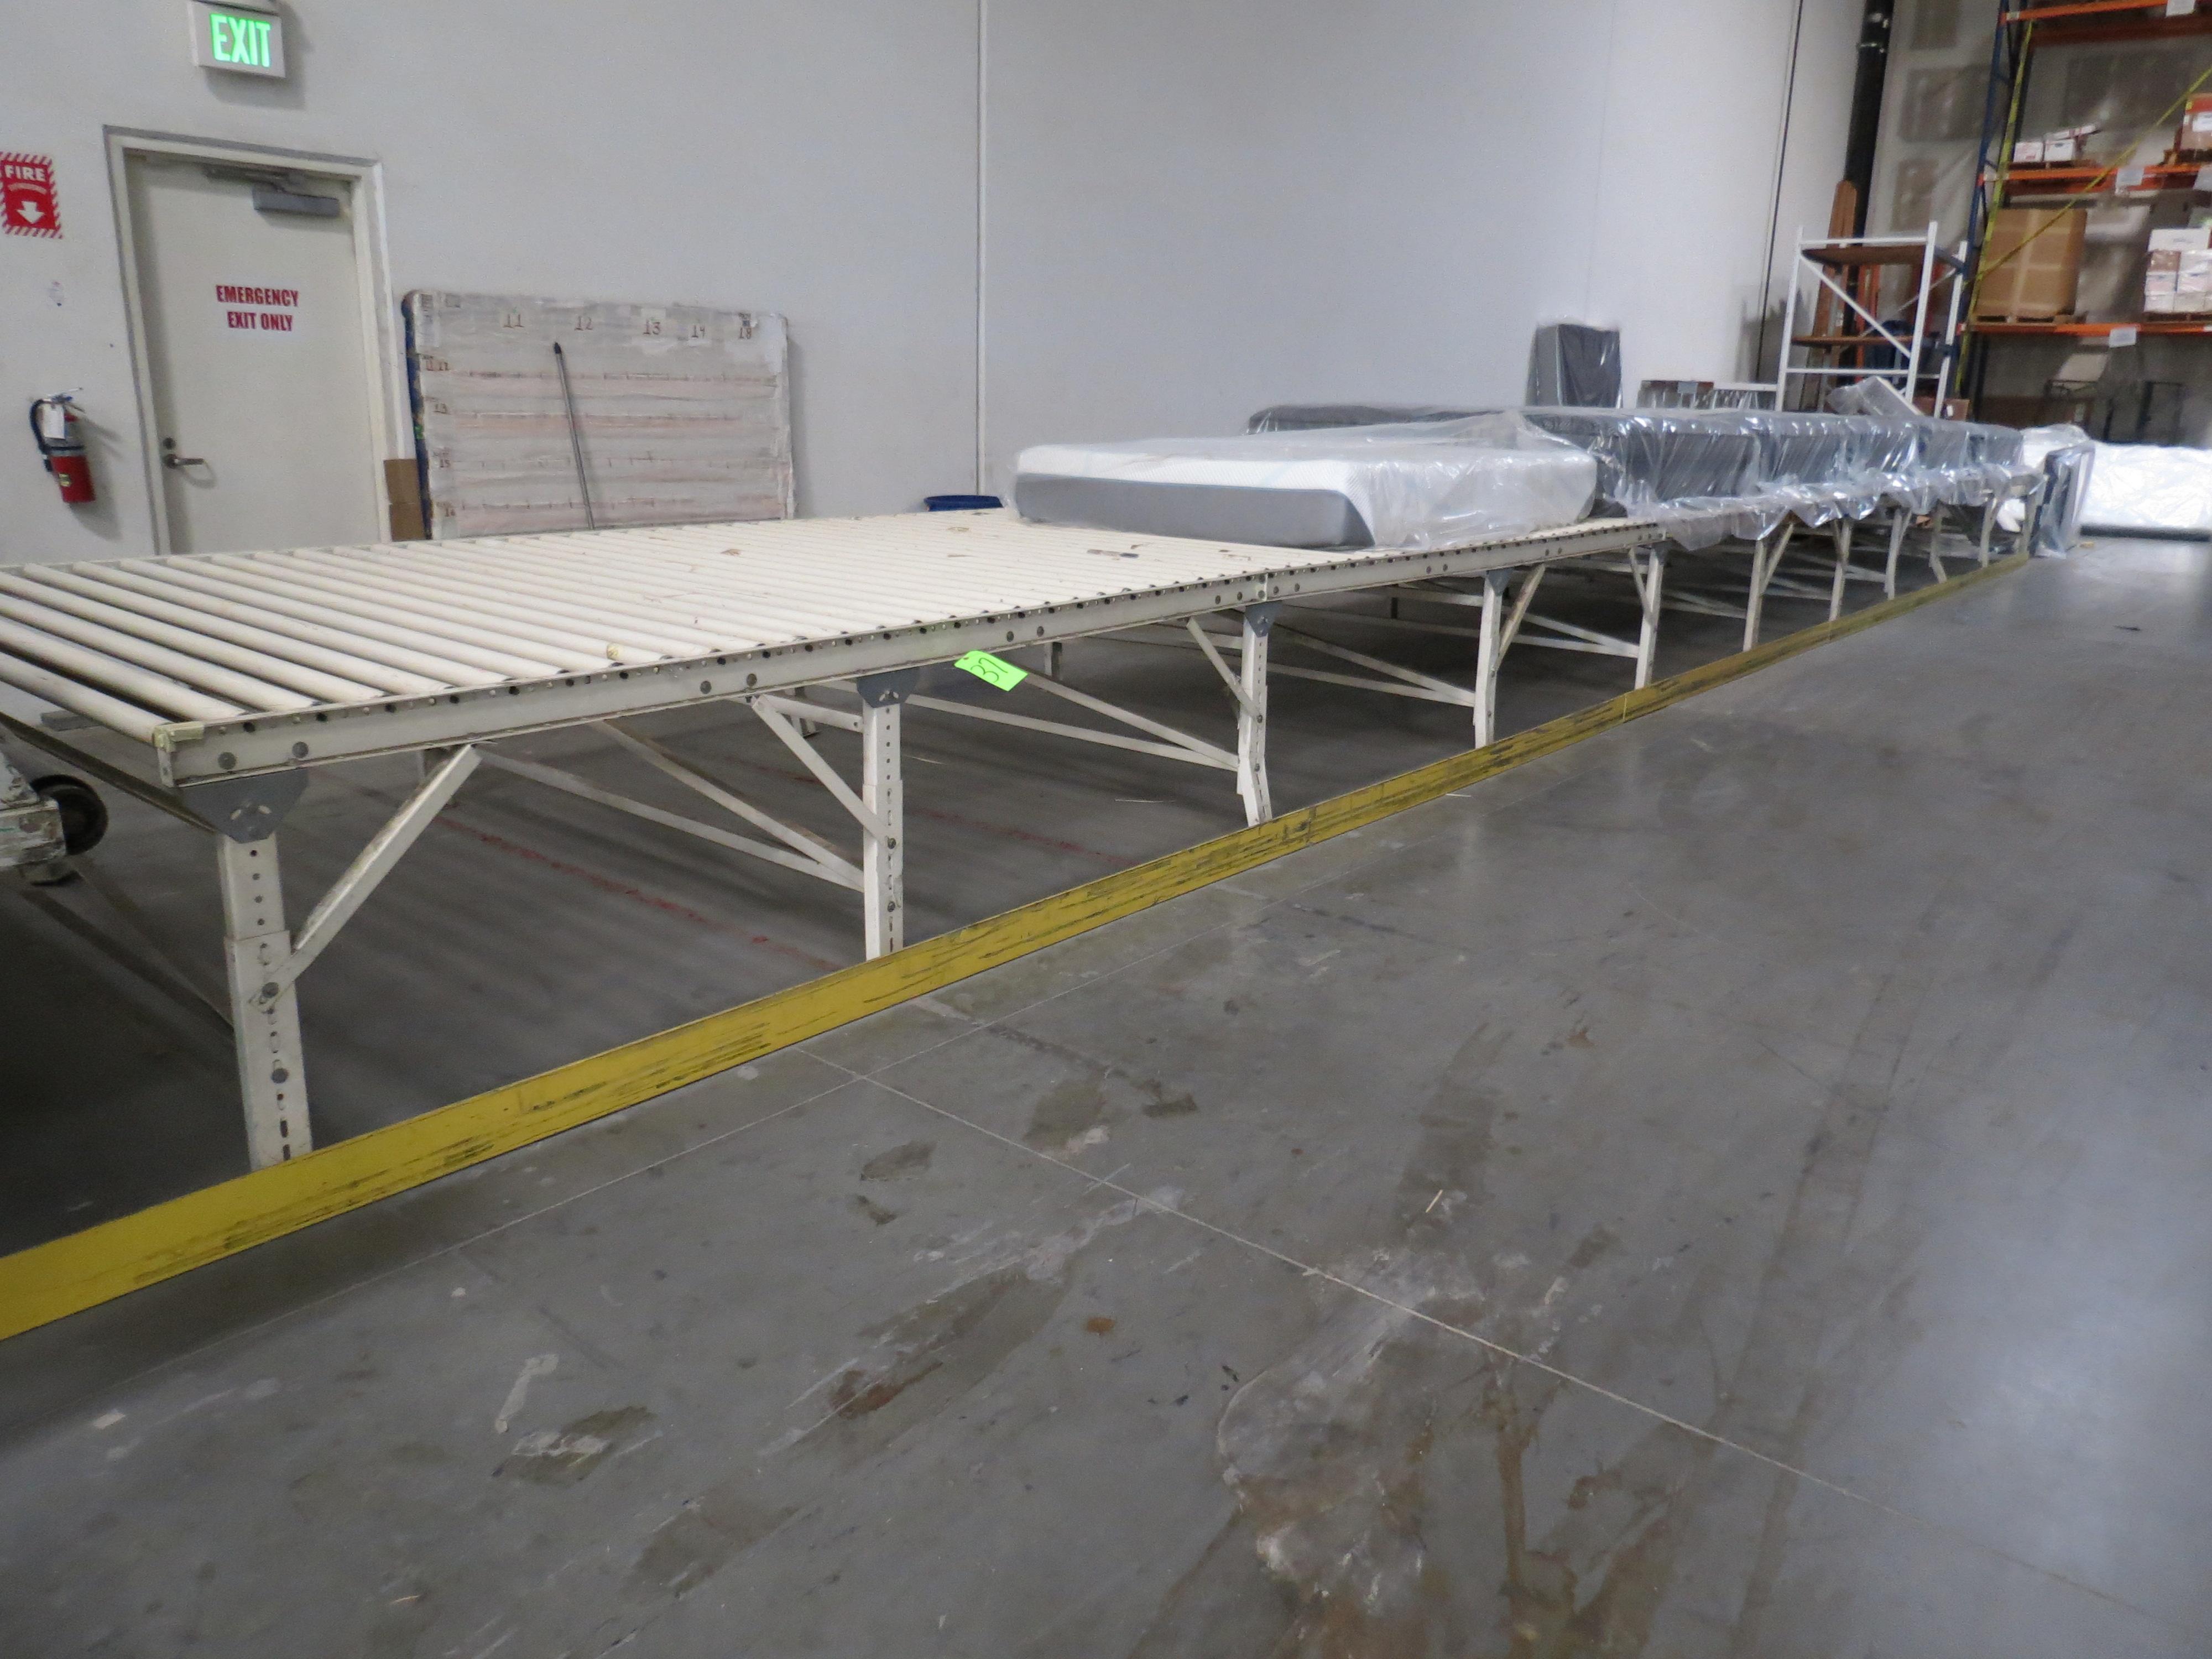 SYD-REN Conveyor Manual Feed Approximate Feet 7' X 50'